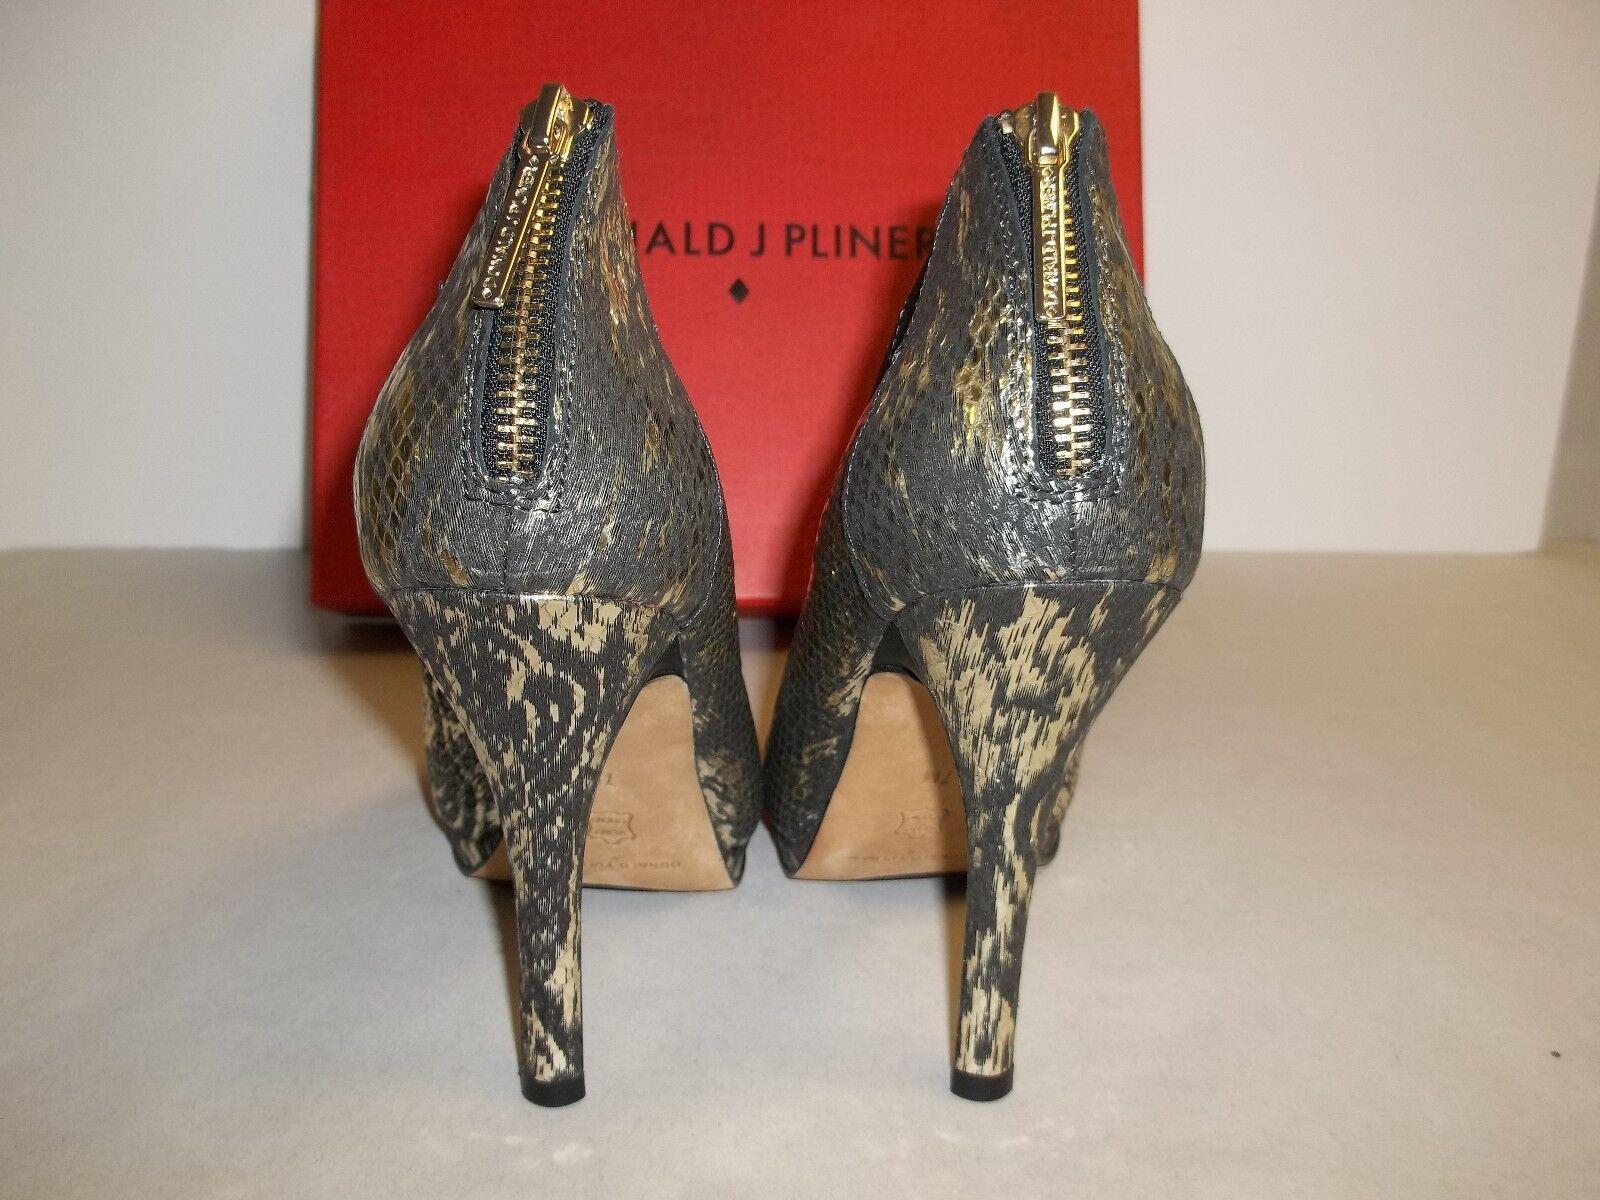 Donald J Pliner tamaño tamaño tamaño 7 M Sassi Platino Cuero Botín Nuevos Mujer Zapatos De Plataforma 08ab63